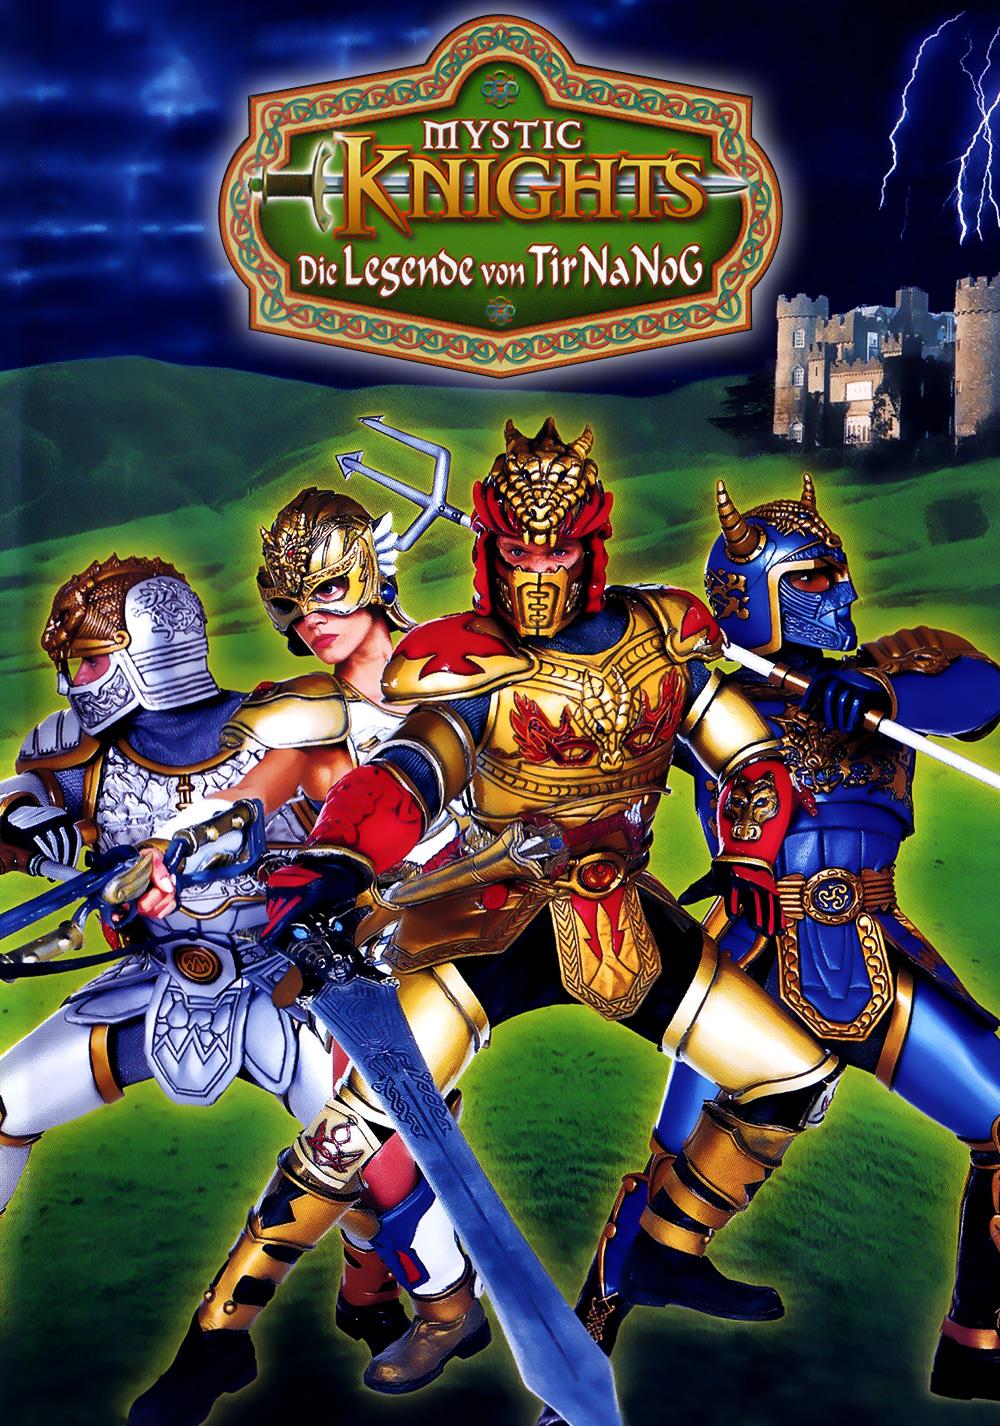 Mystic Knights Of Tir Na Nog 2